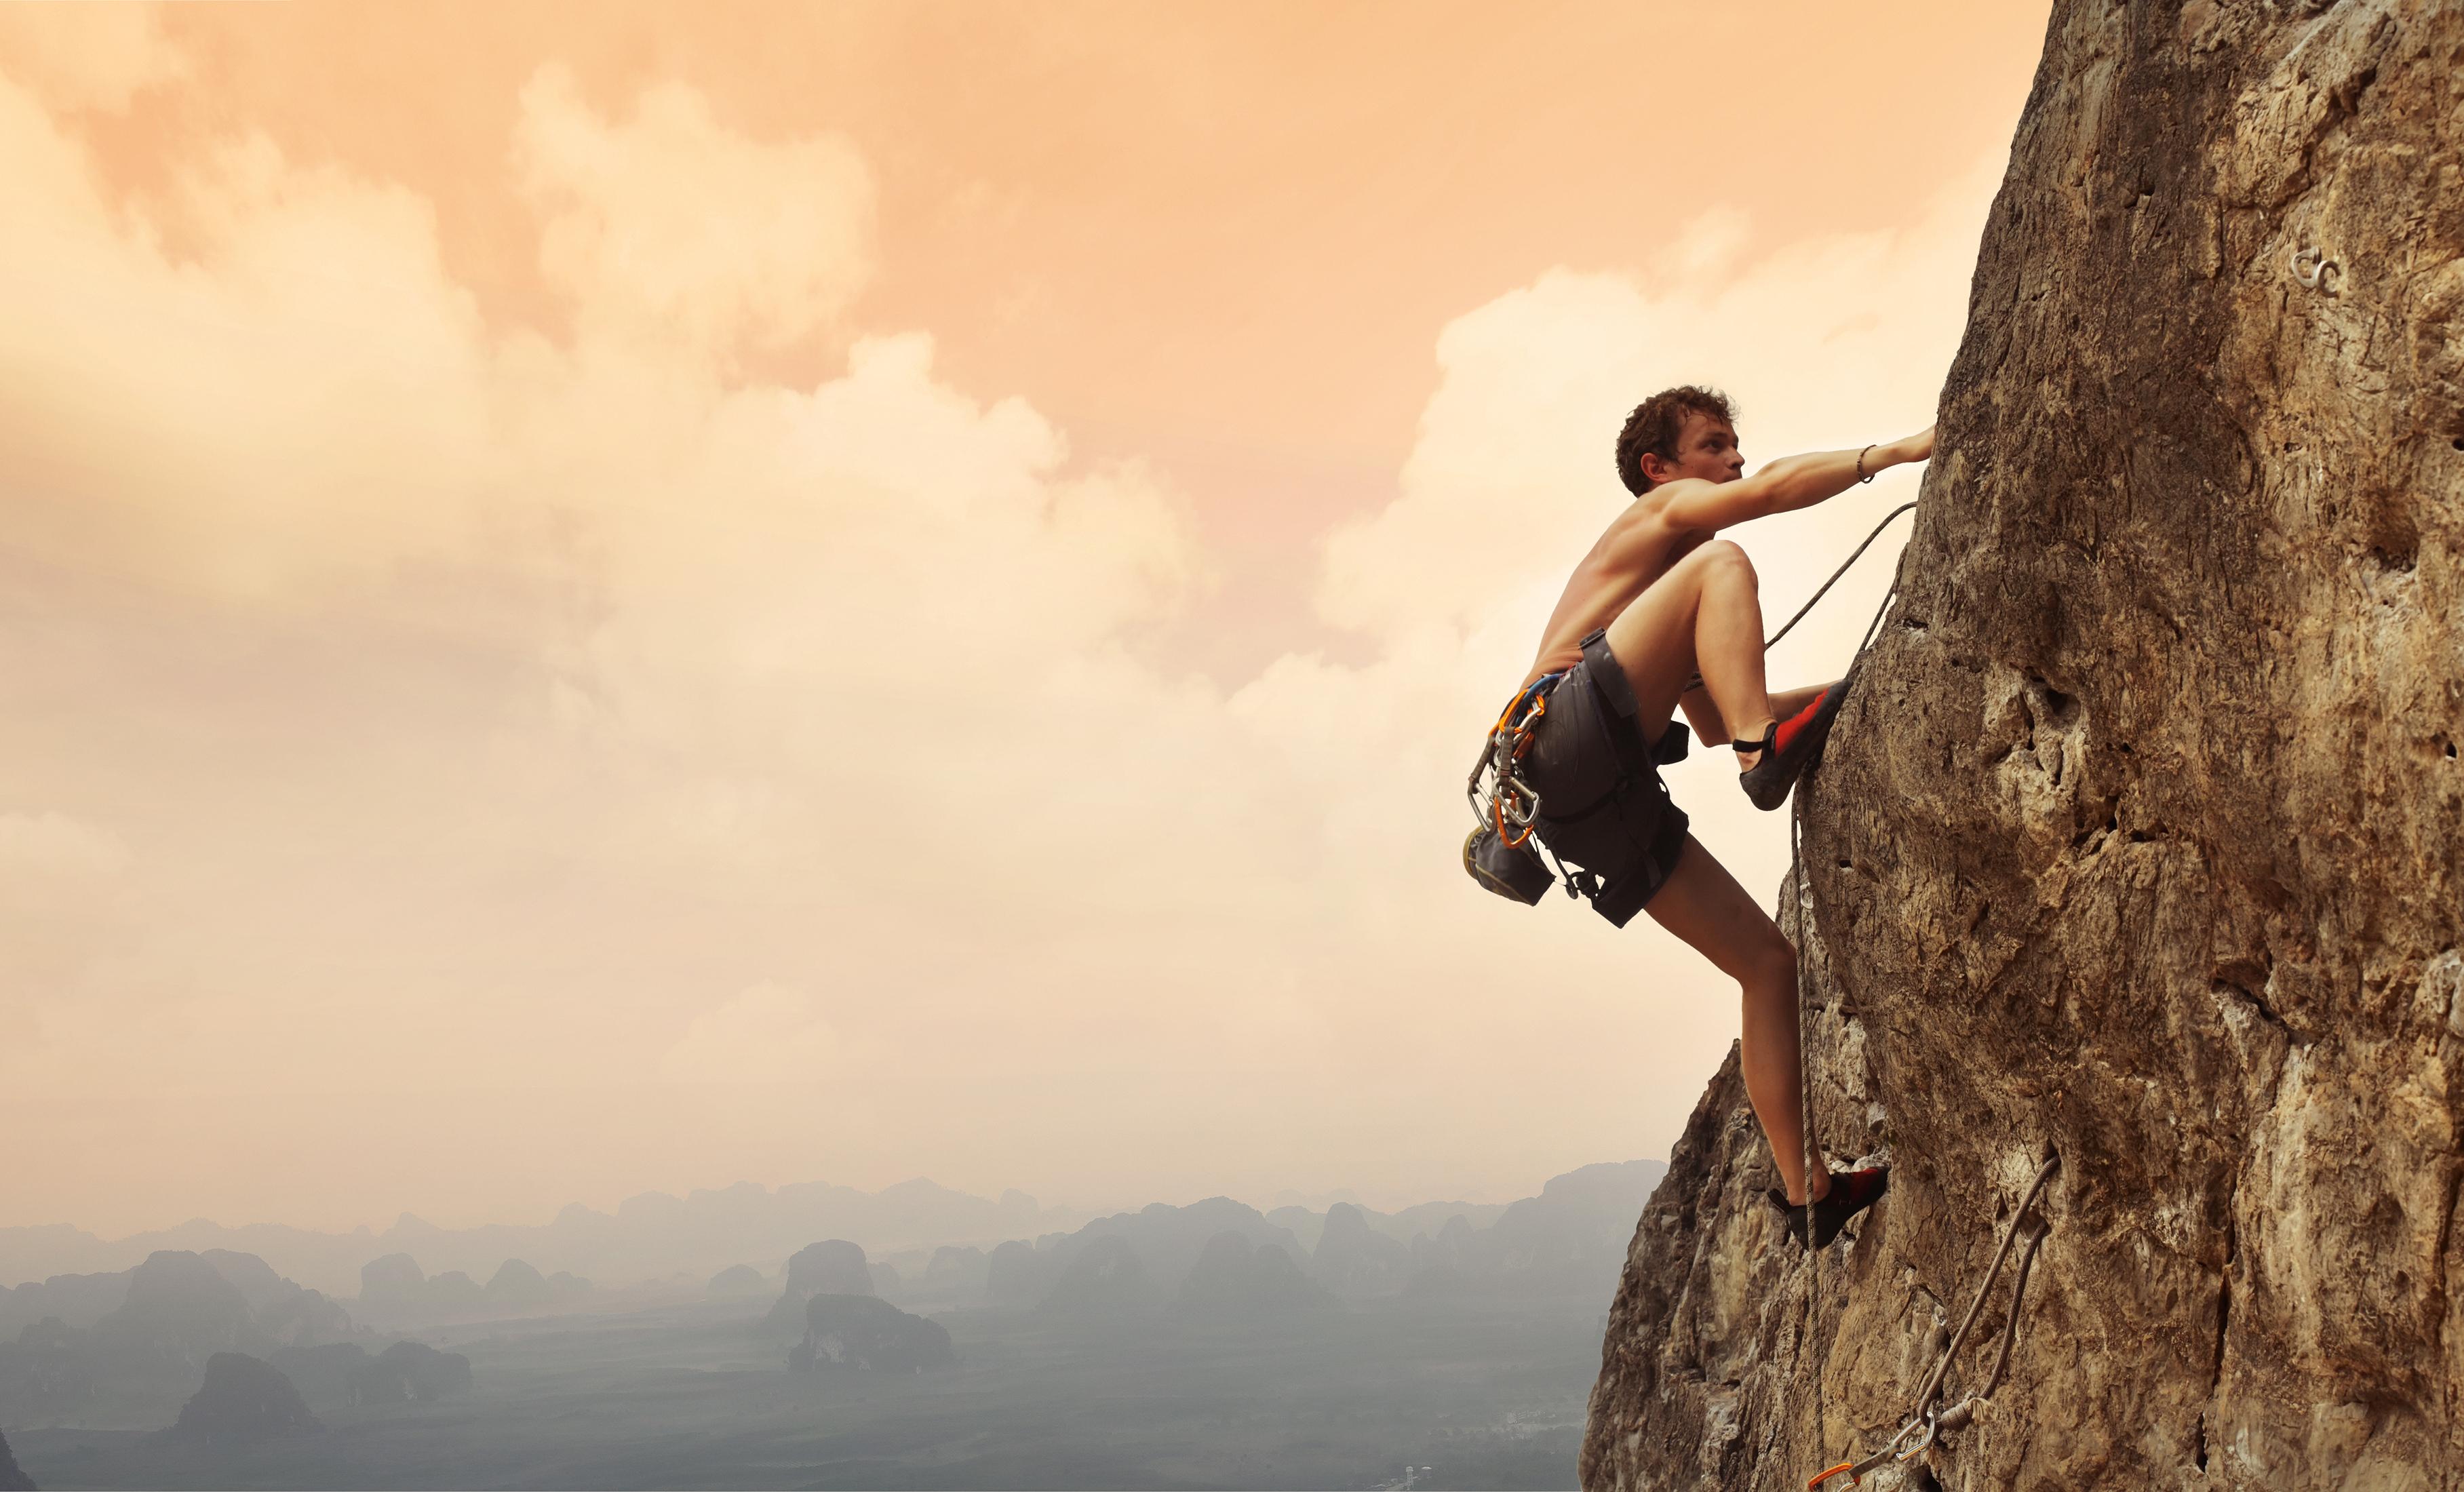 Ff4151adbee1244737bdf814c593b58962108185 climb